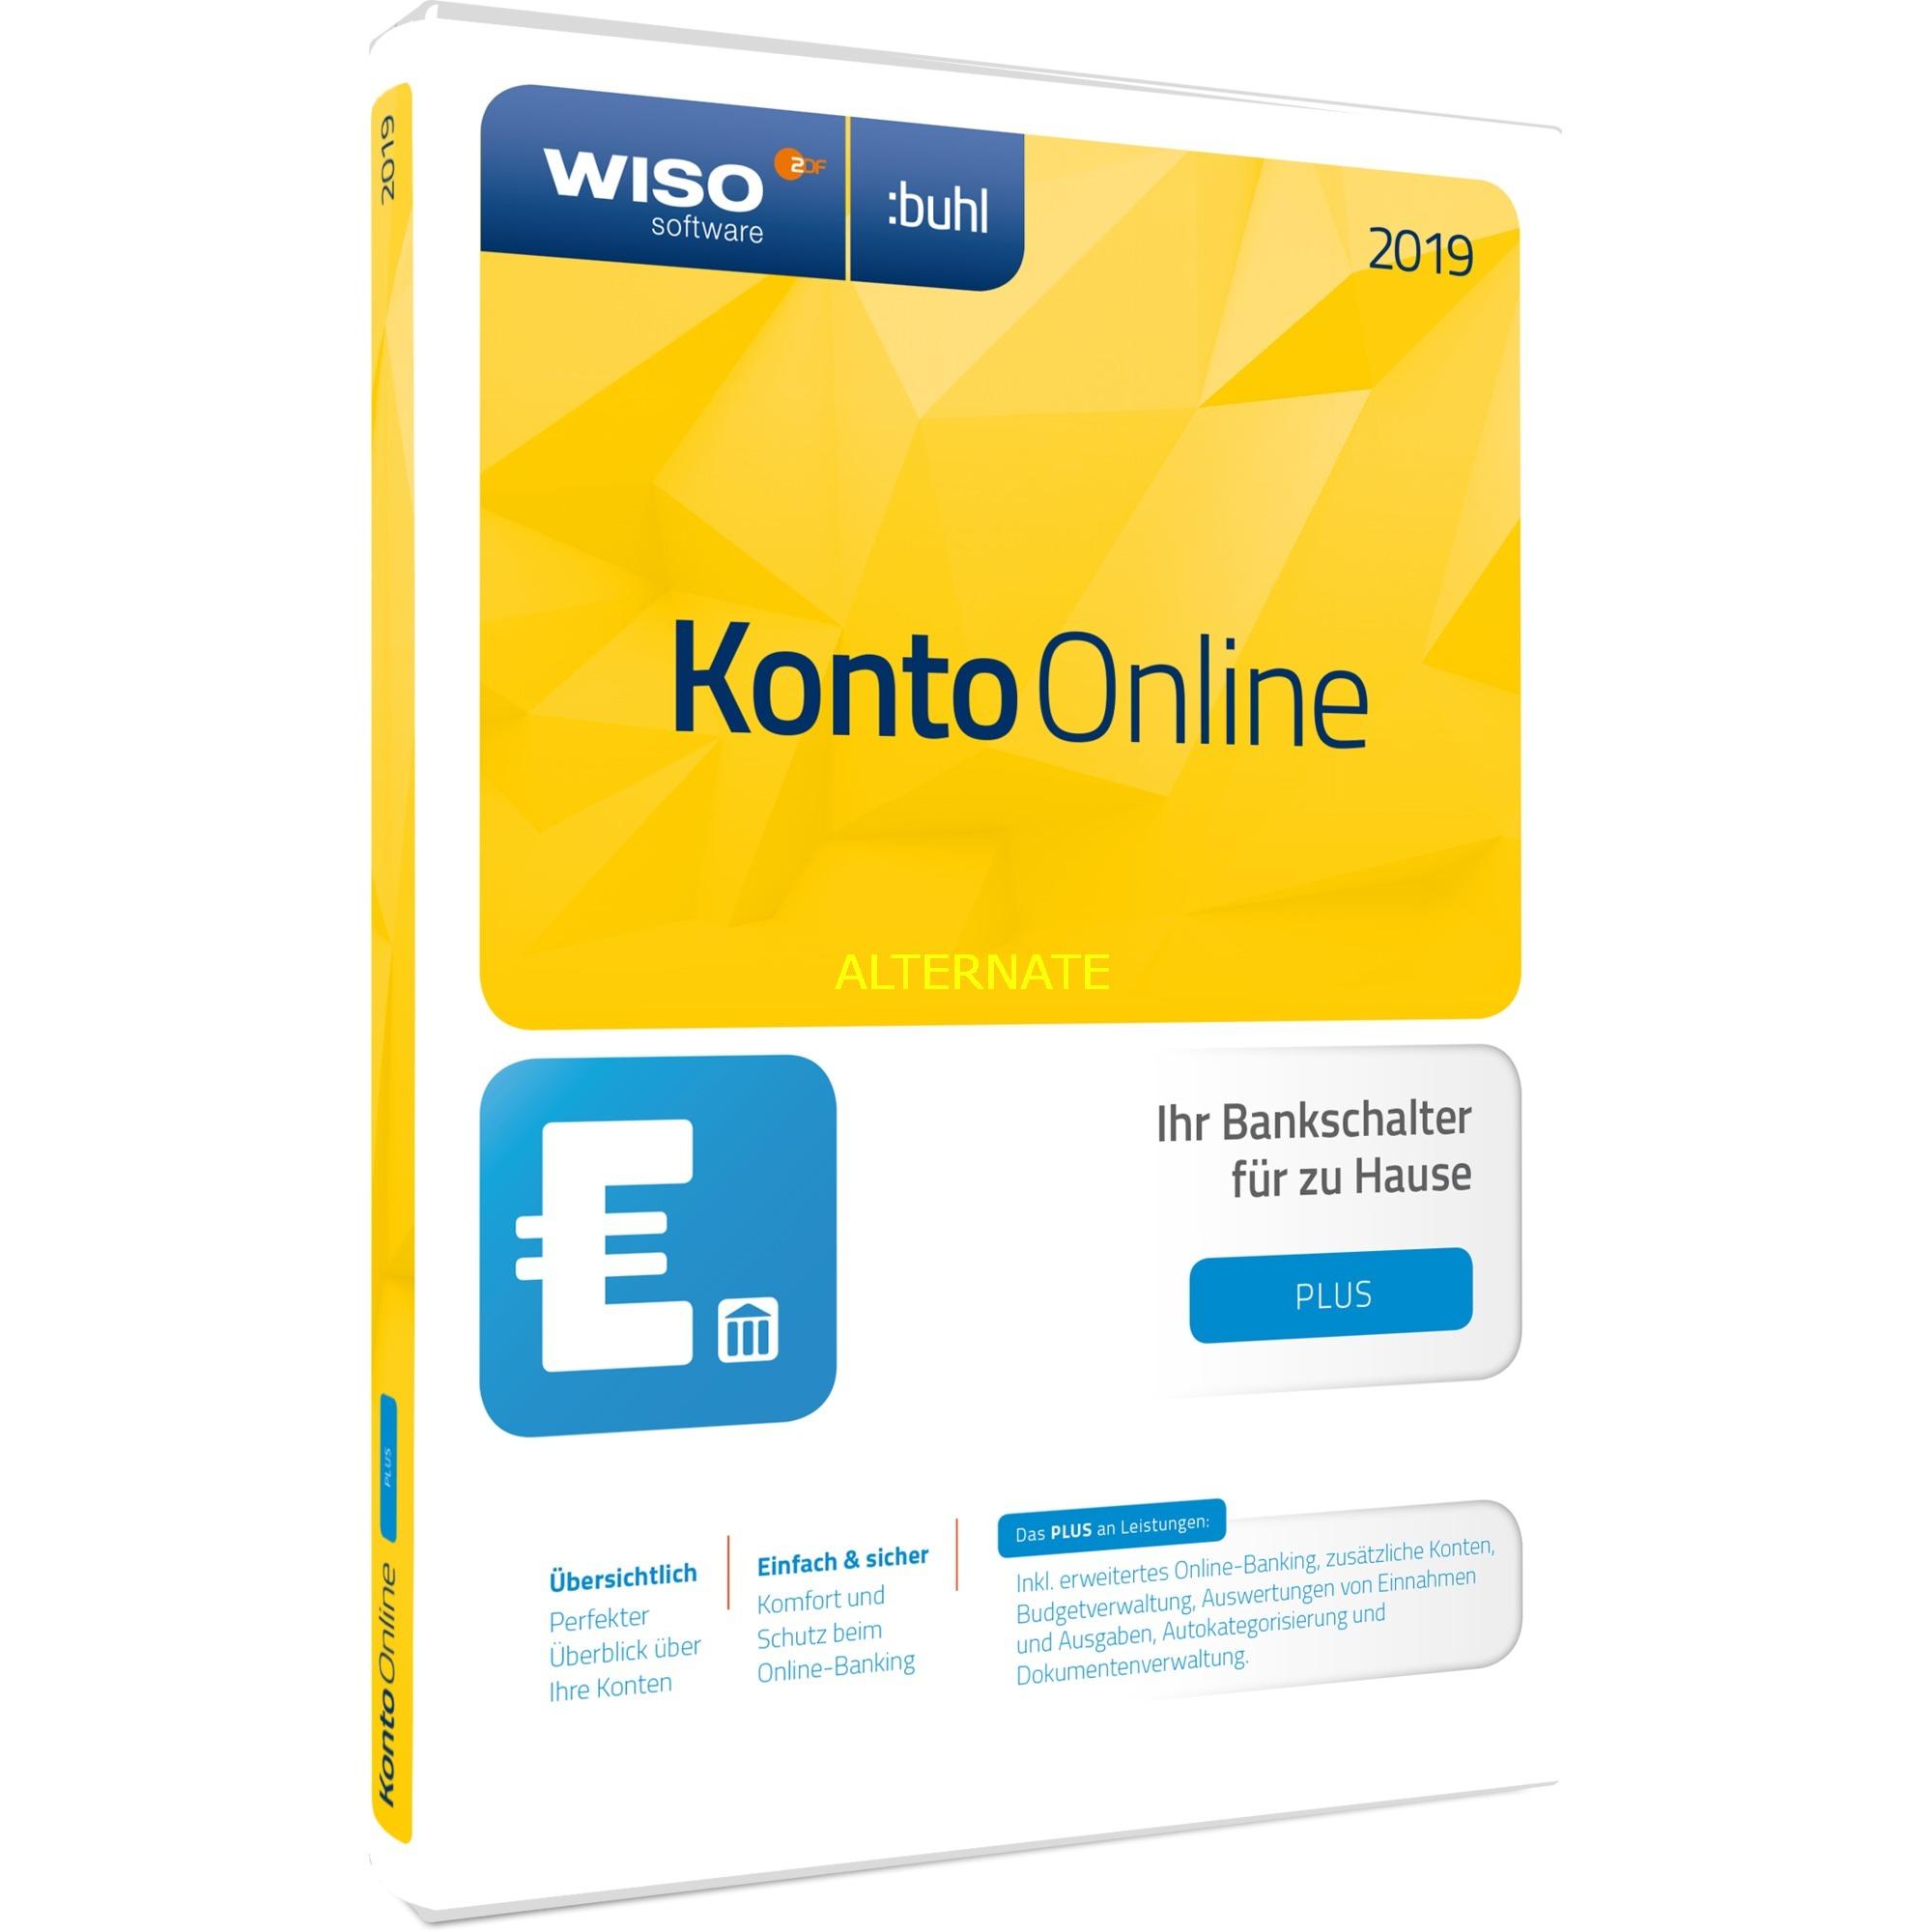 KW42705-19, Software